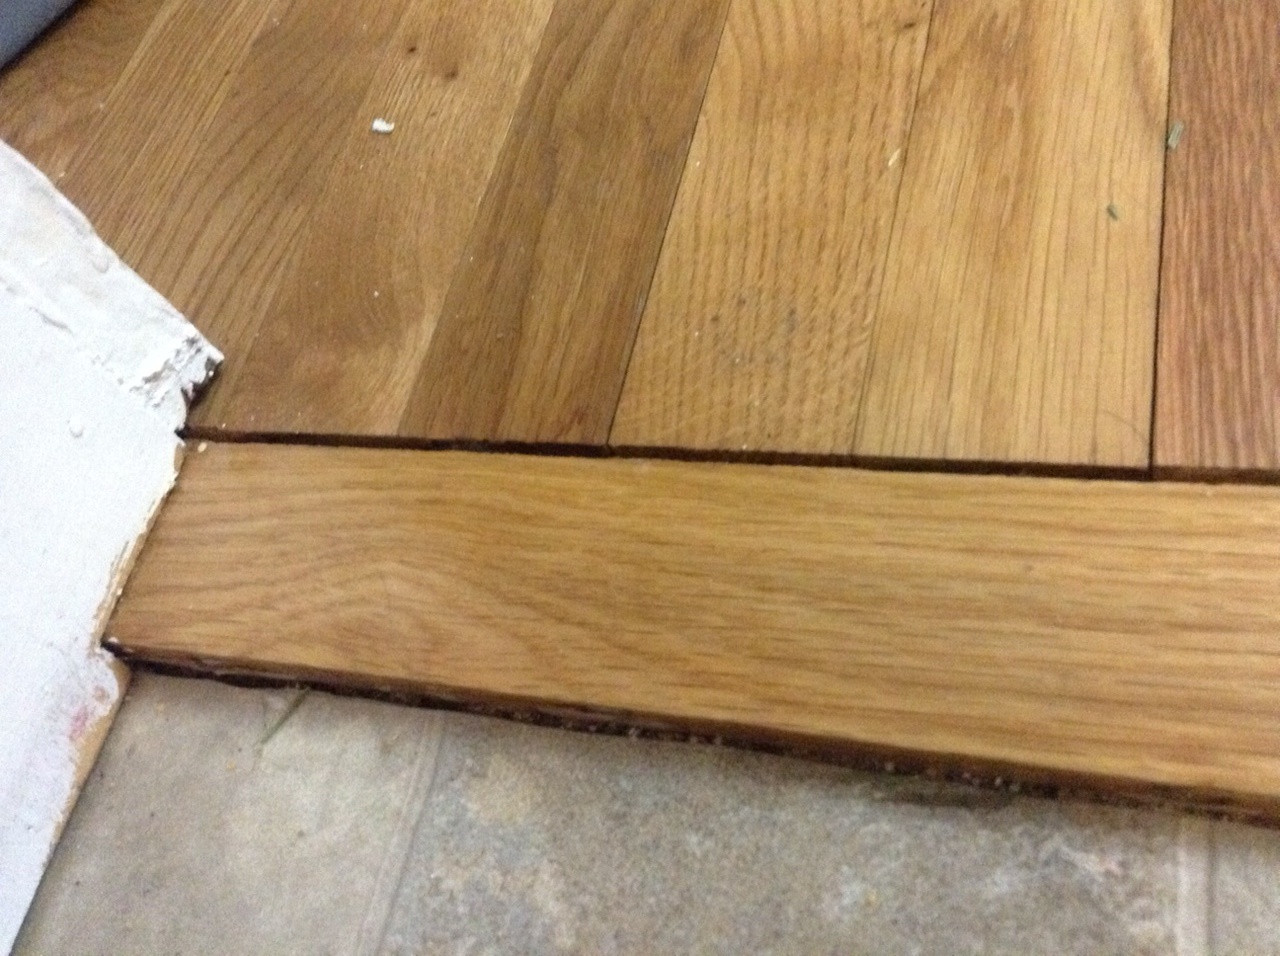 hardwood floor refinishing bay area of wood floor techniques 101 with regard to gap shrinkage cork